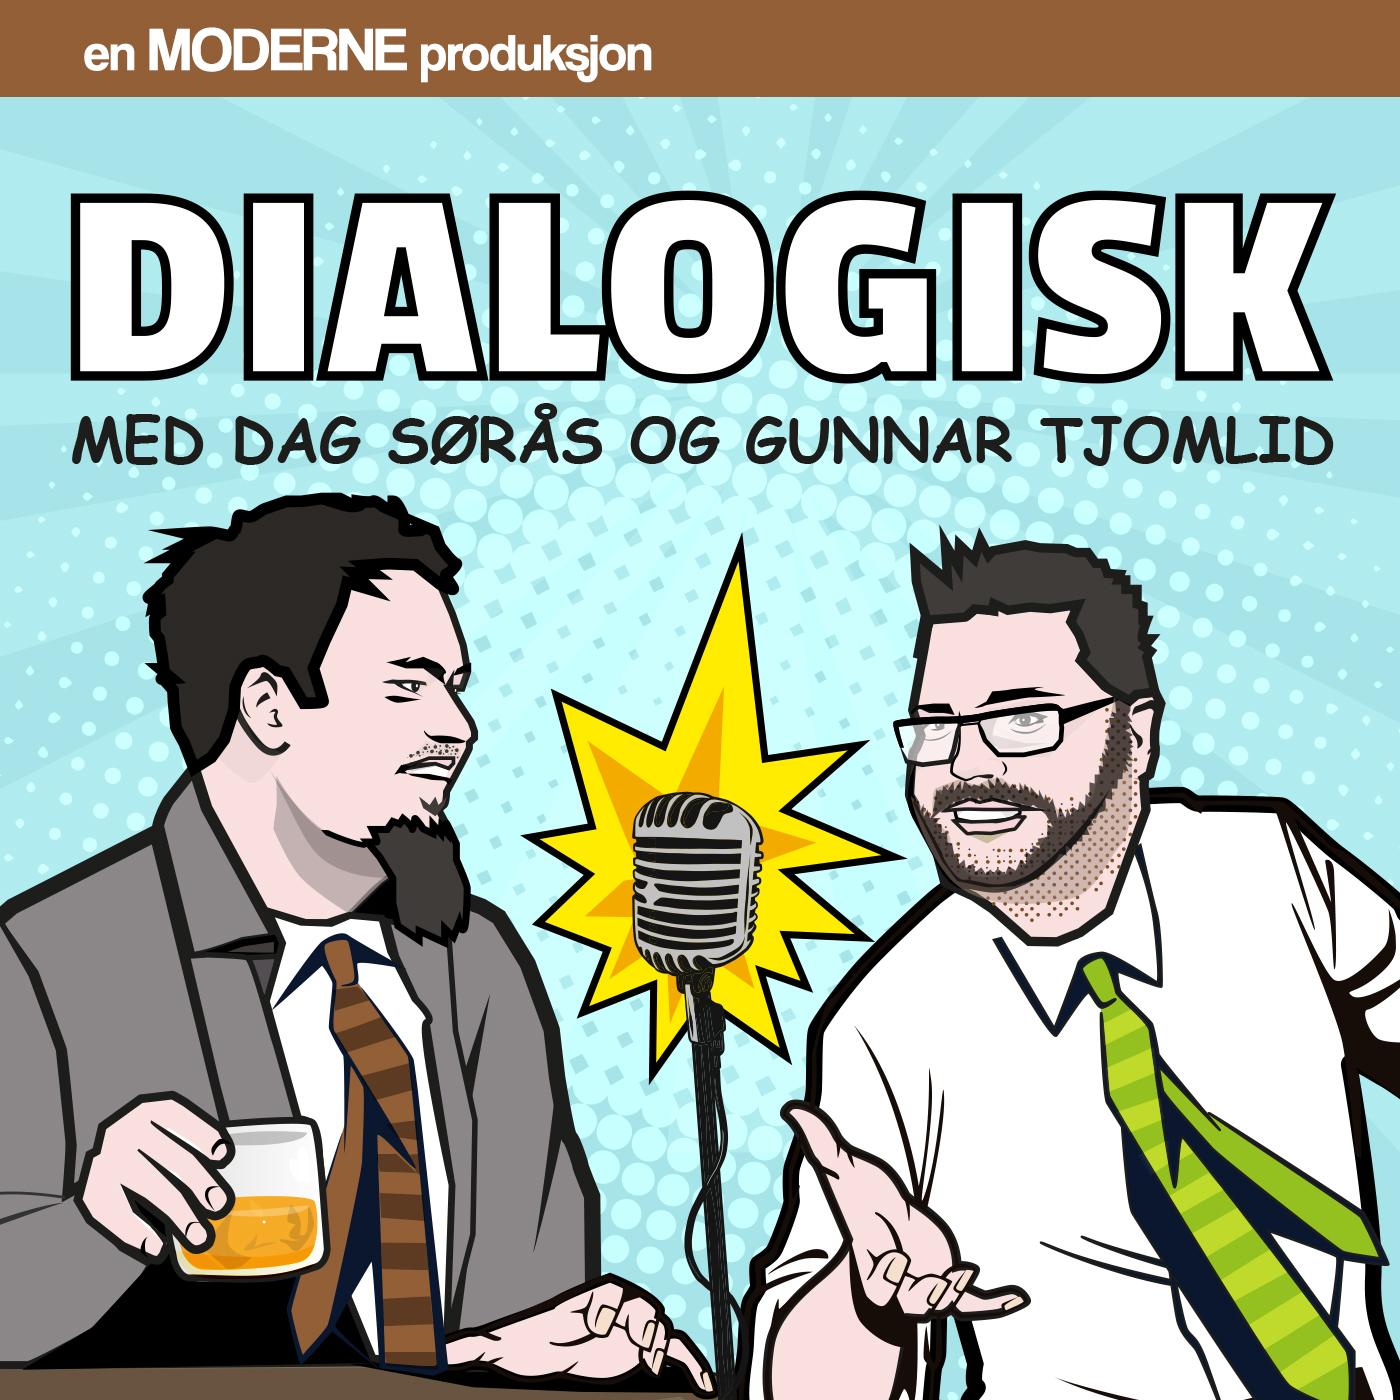 Dialogiskcover1400x1400.jpg